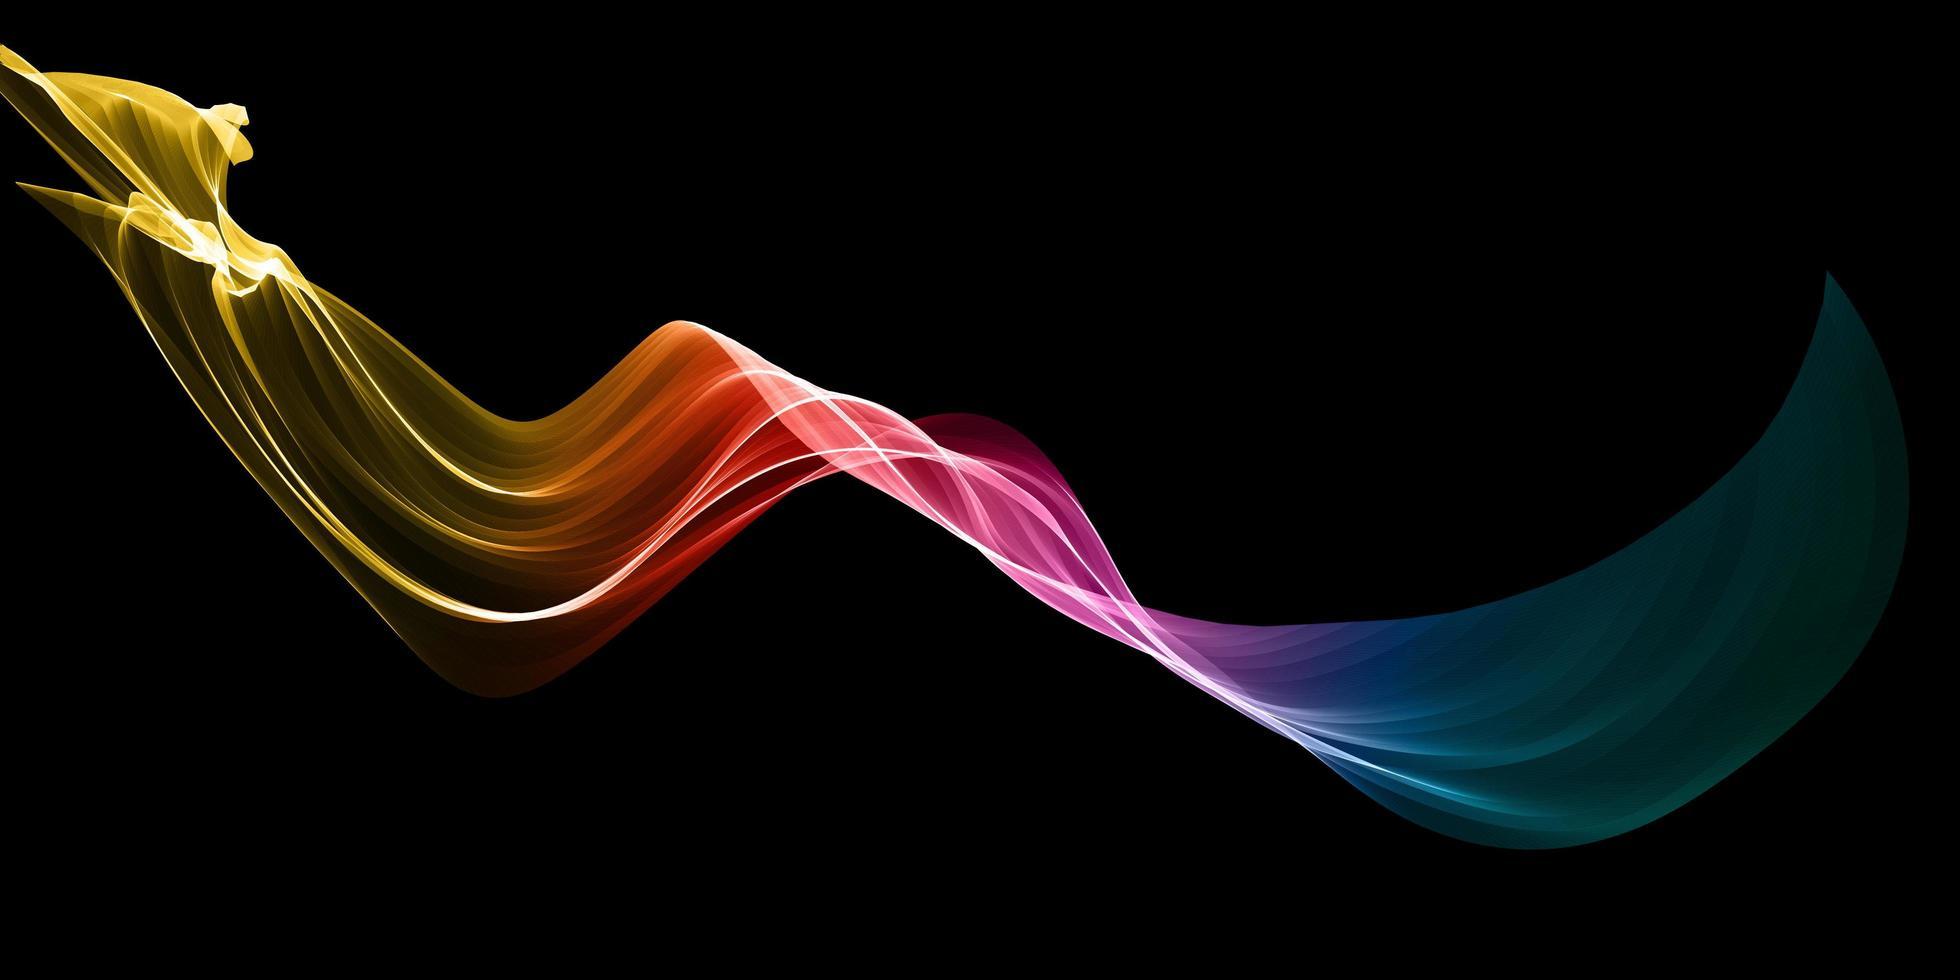 Regenbogen fließende Linien Design vektor